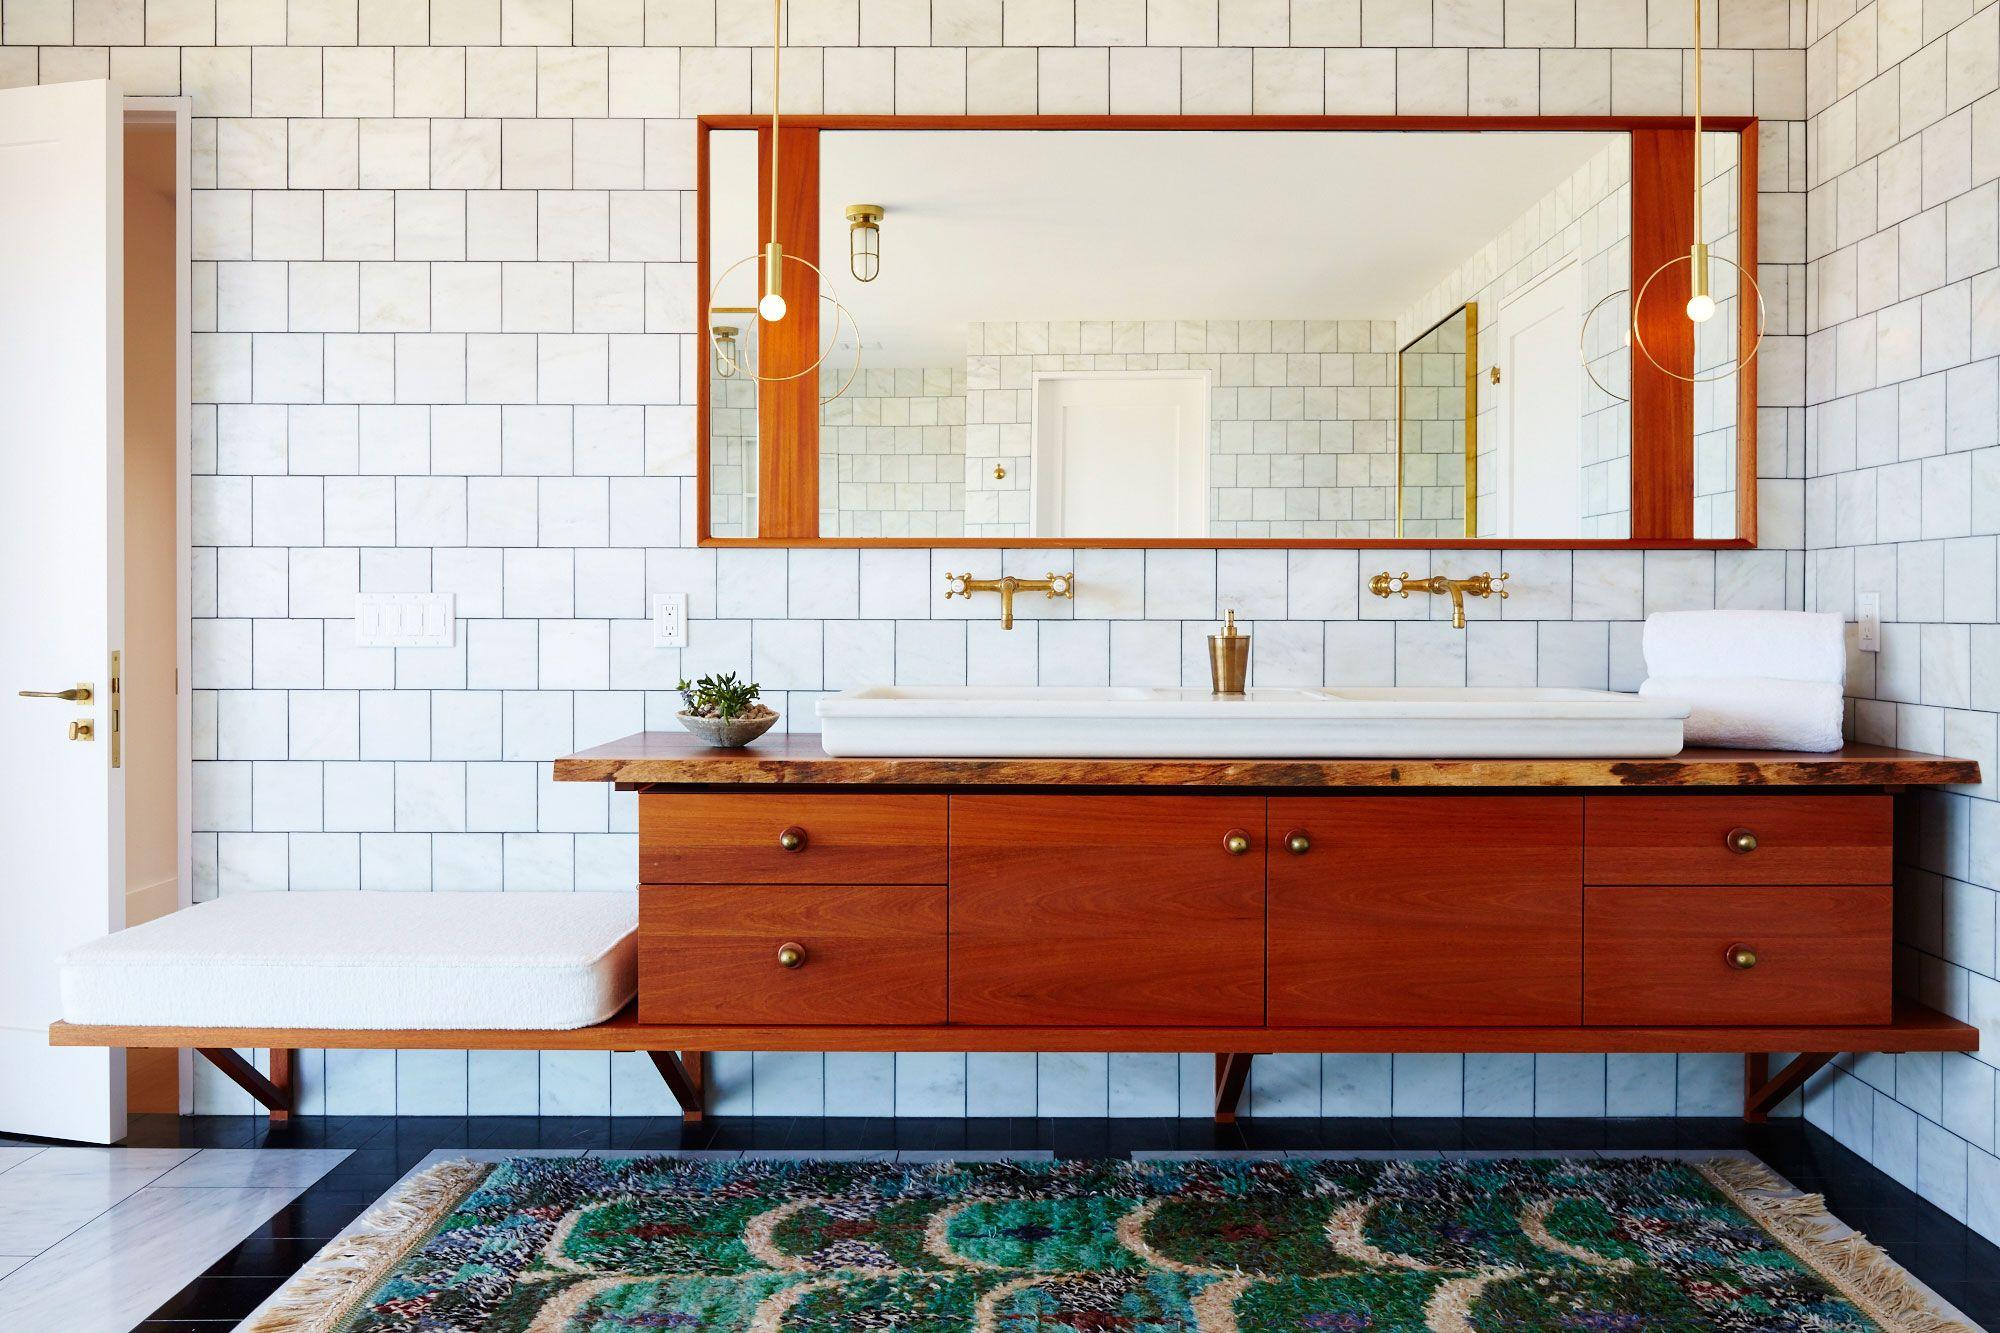 100 best room decorating ideas home design pictures rh housebeautiful com best design for room wall best design bedroom